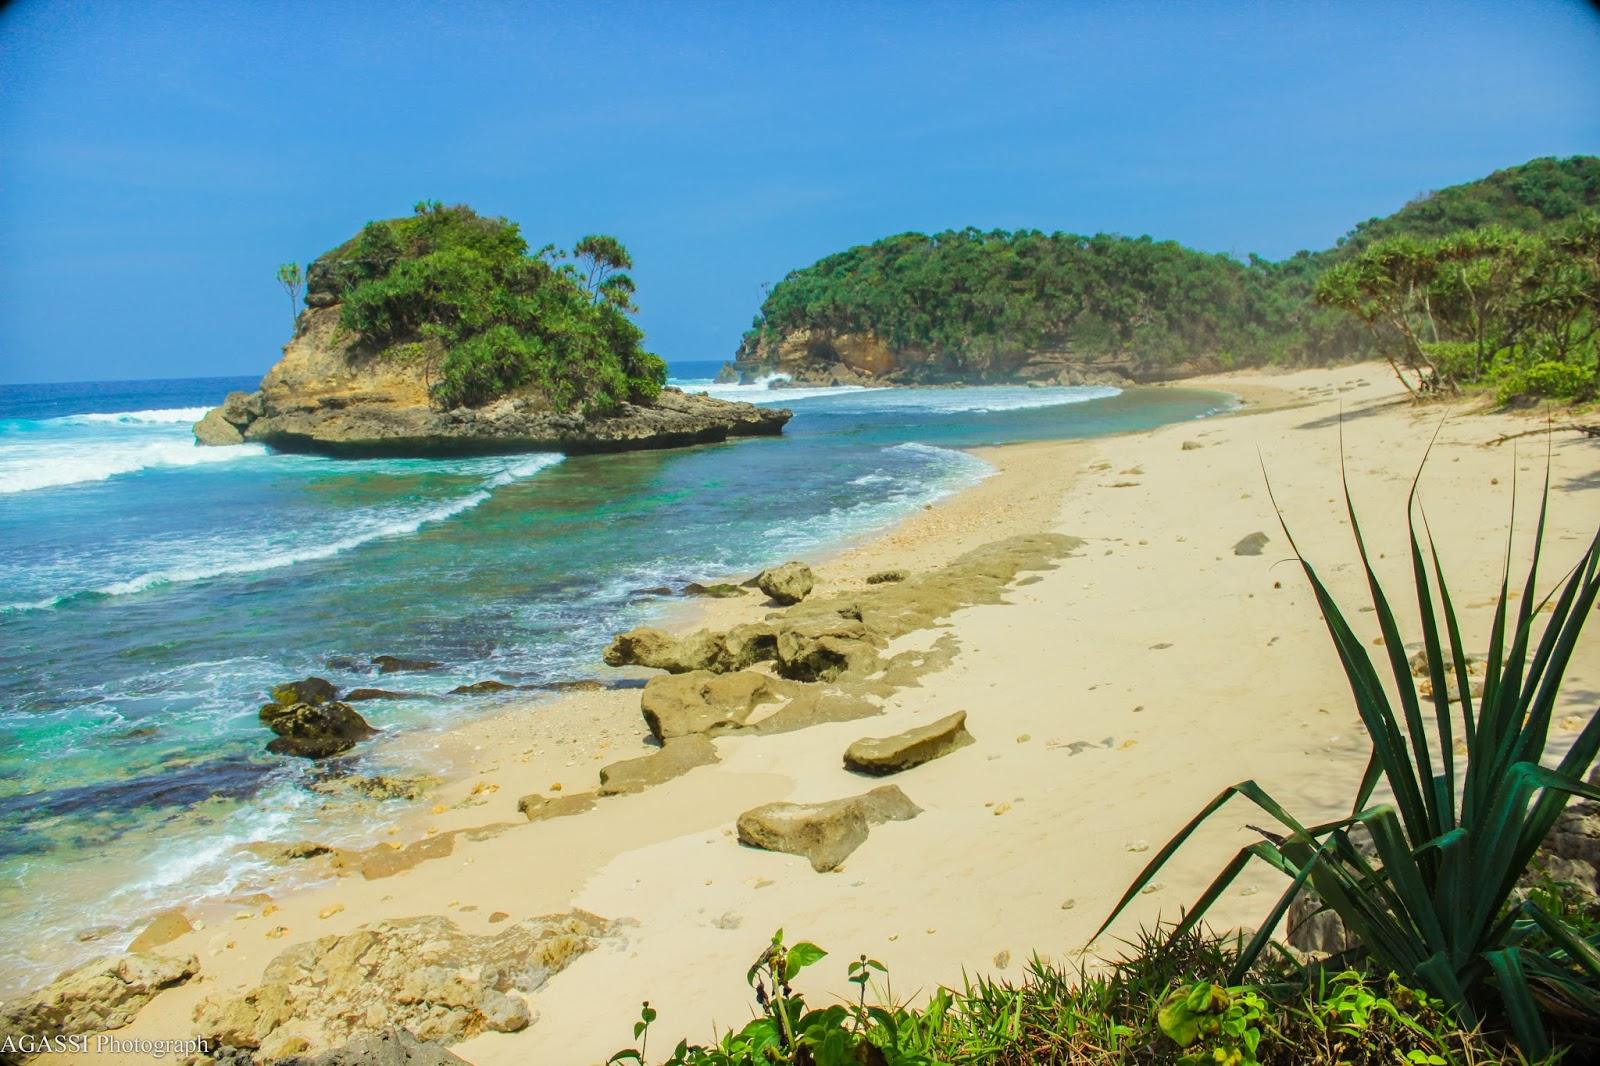 Wisata Ke Pantai Jonggring Saloko - MANISA TRAVEL MALANG : Travel ...